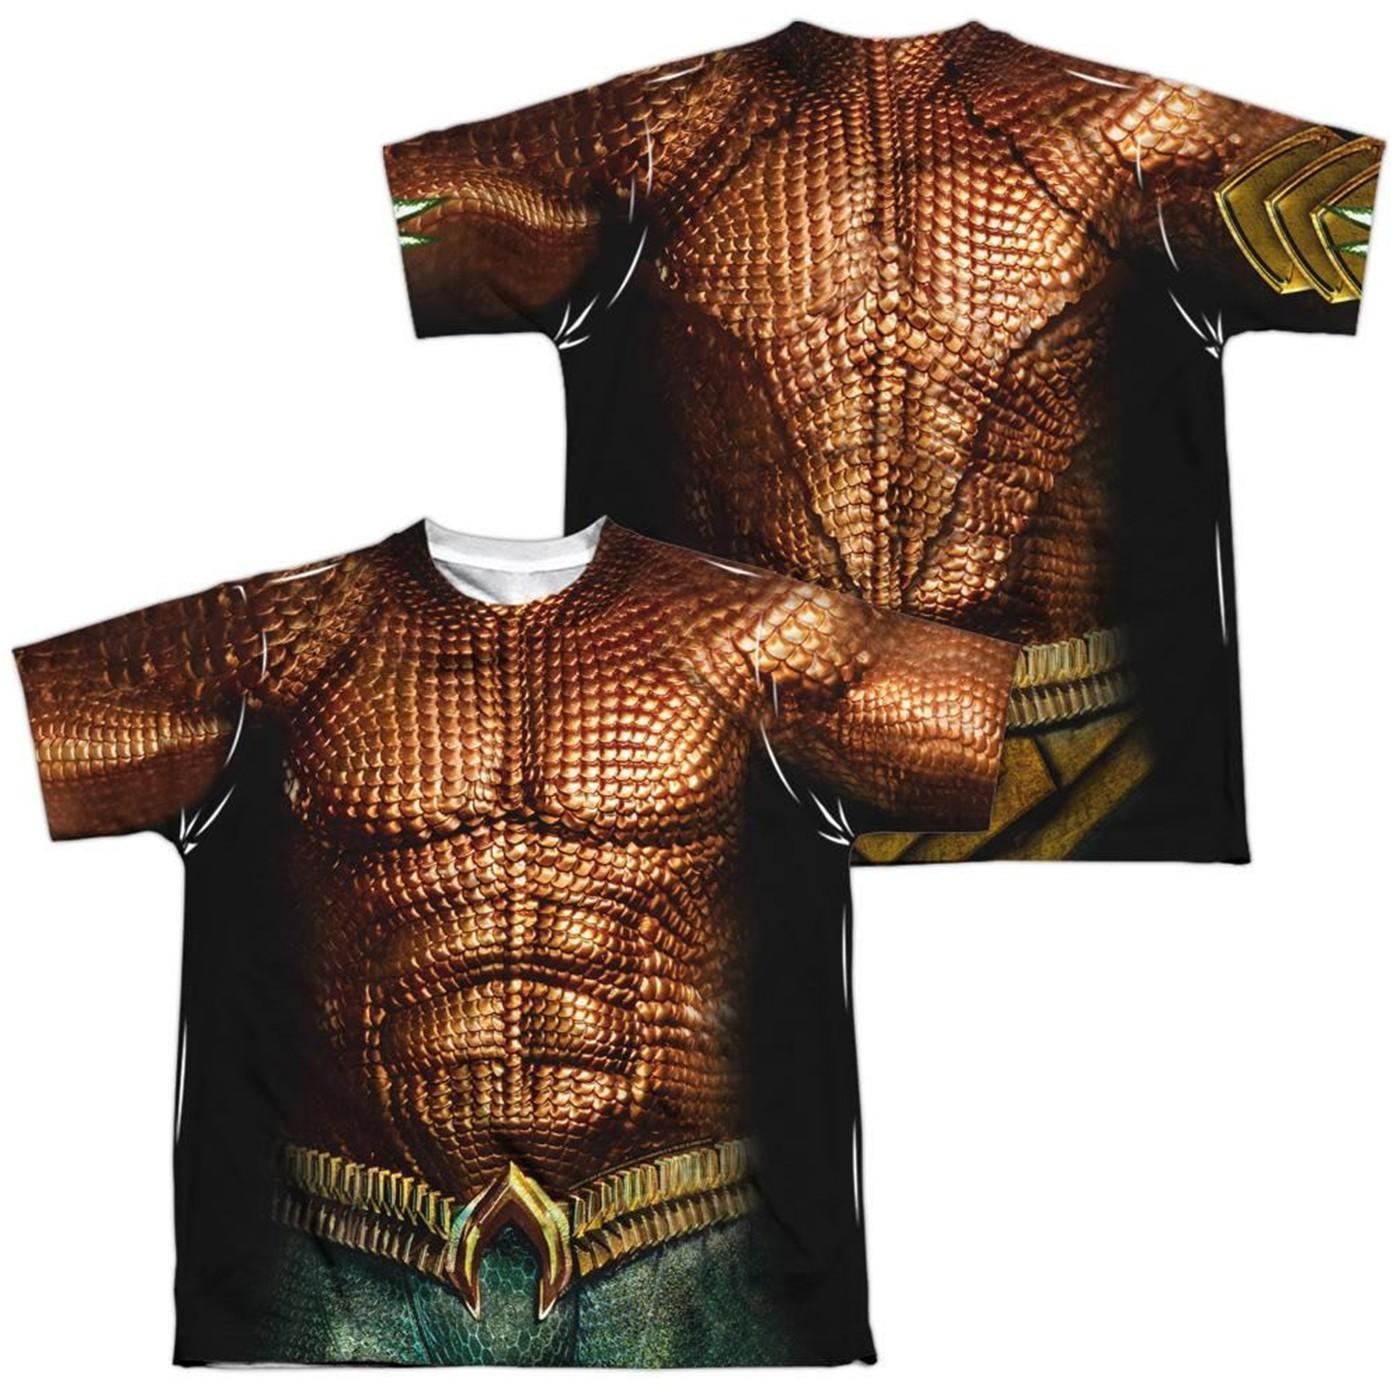 Aquaman Movie Double Sided Costume Men's T-shirt